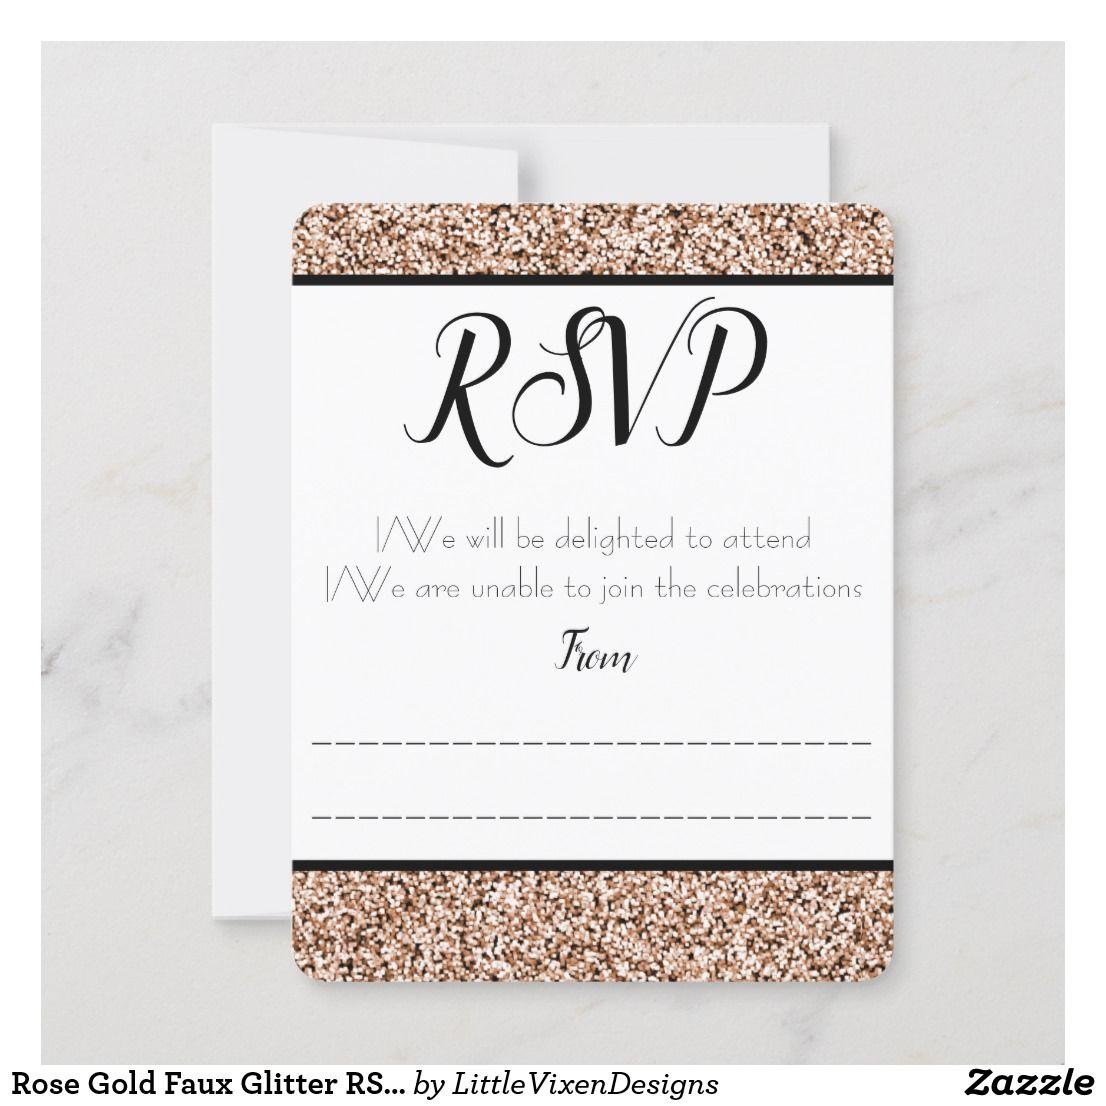 Rose Gold Faux Glitter RSVP / Response Card Zazzle.co.uk